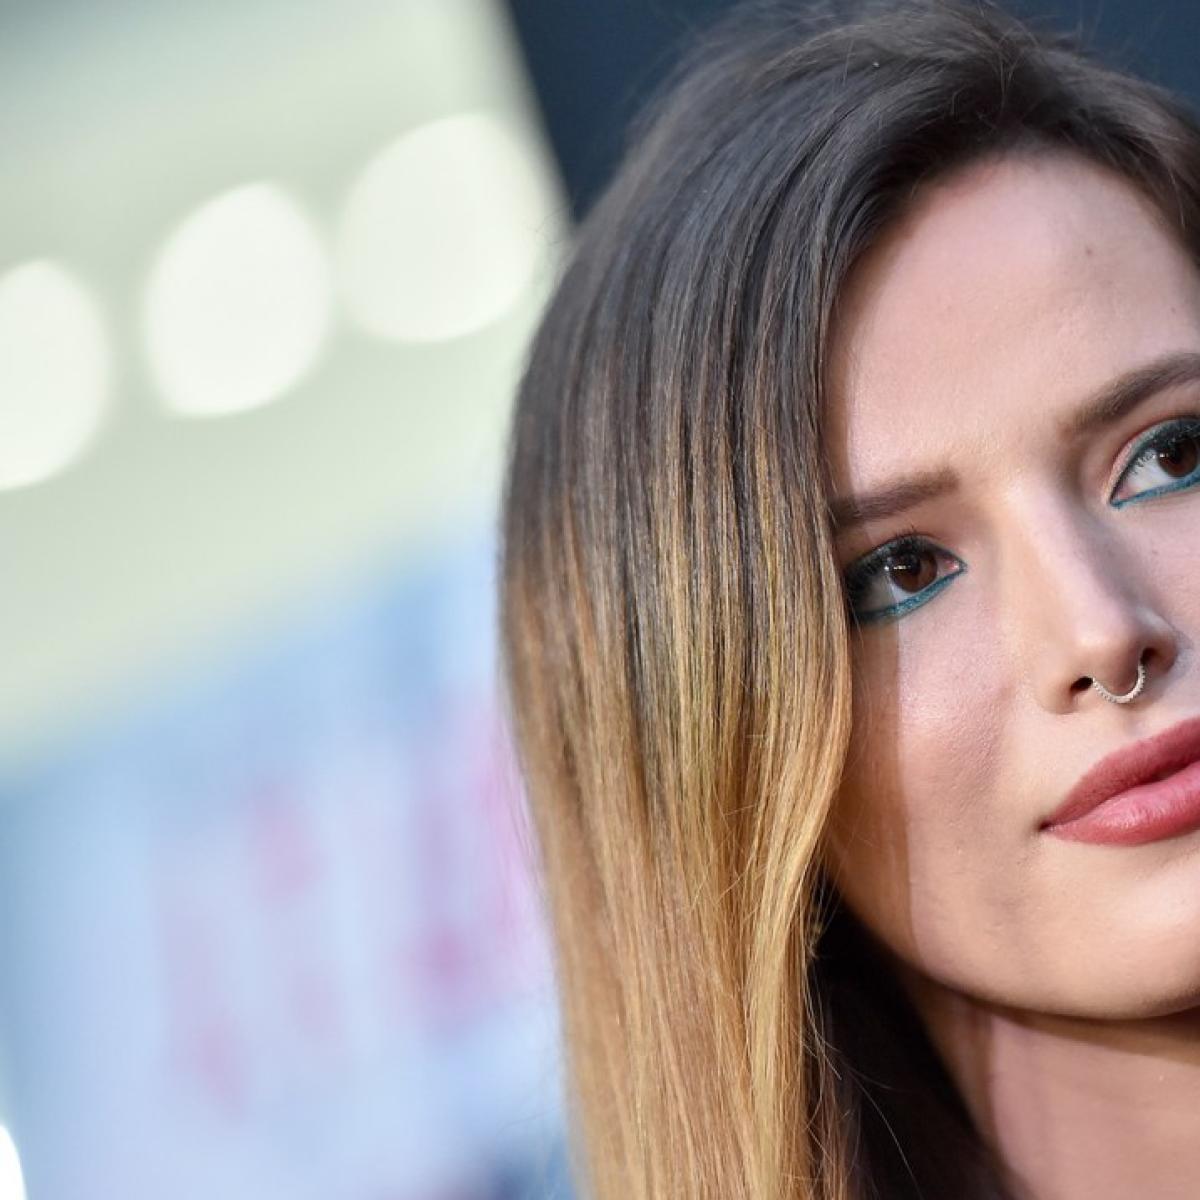 Actress' Perfect Response To Hacker Trolls